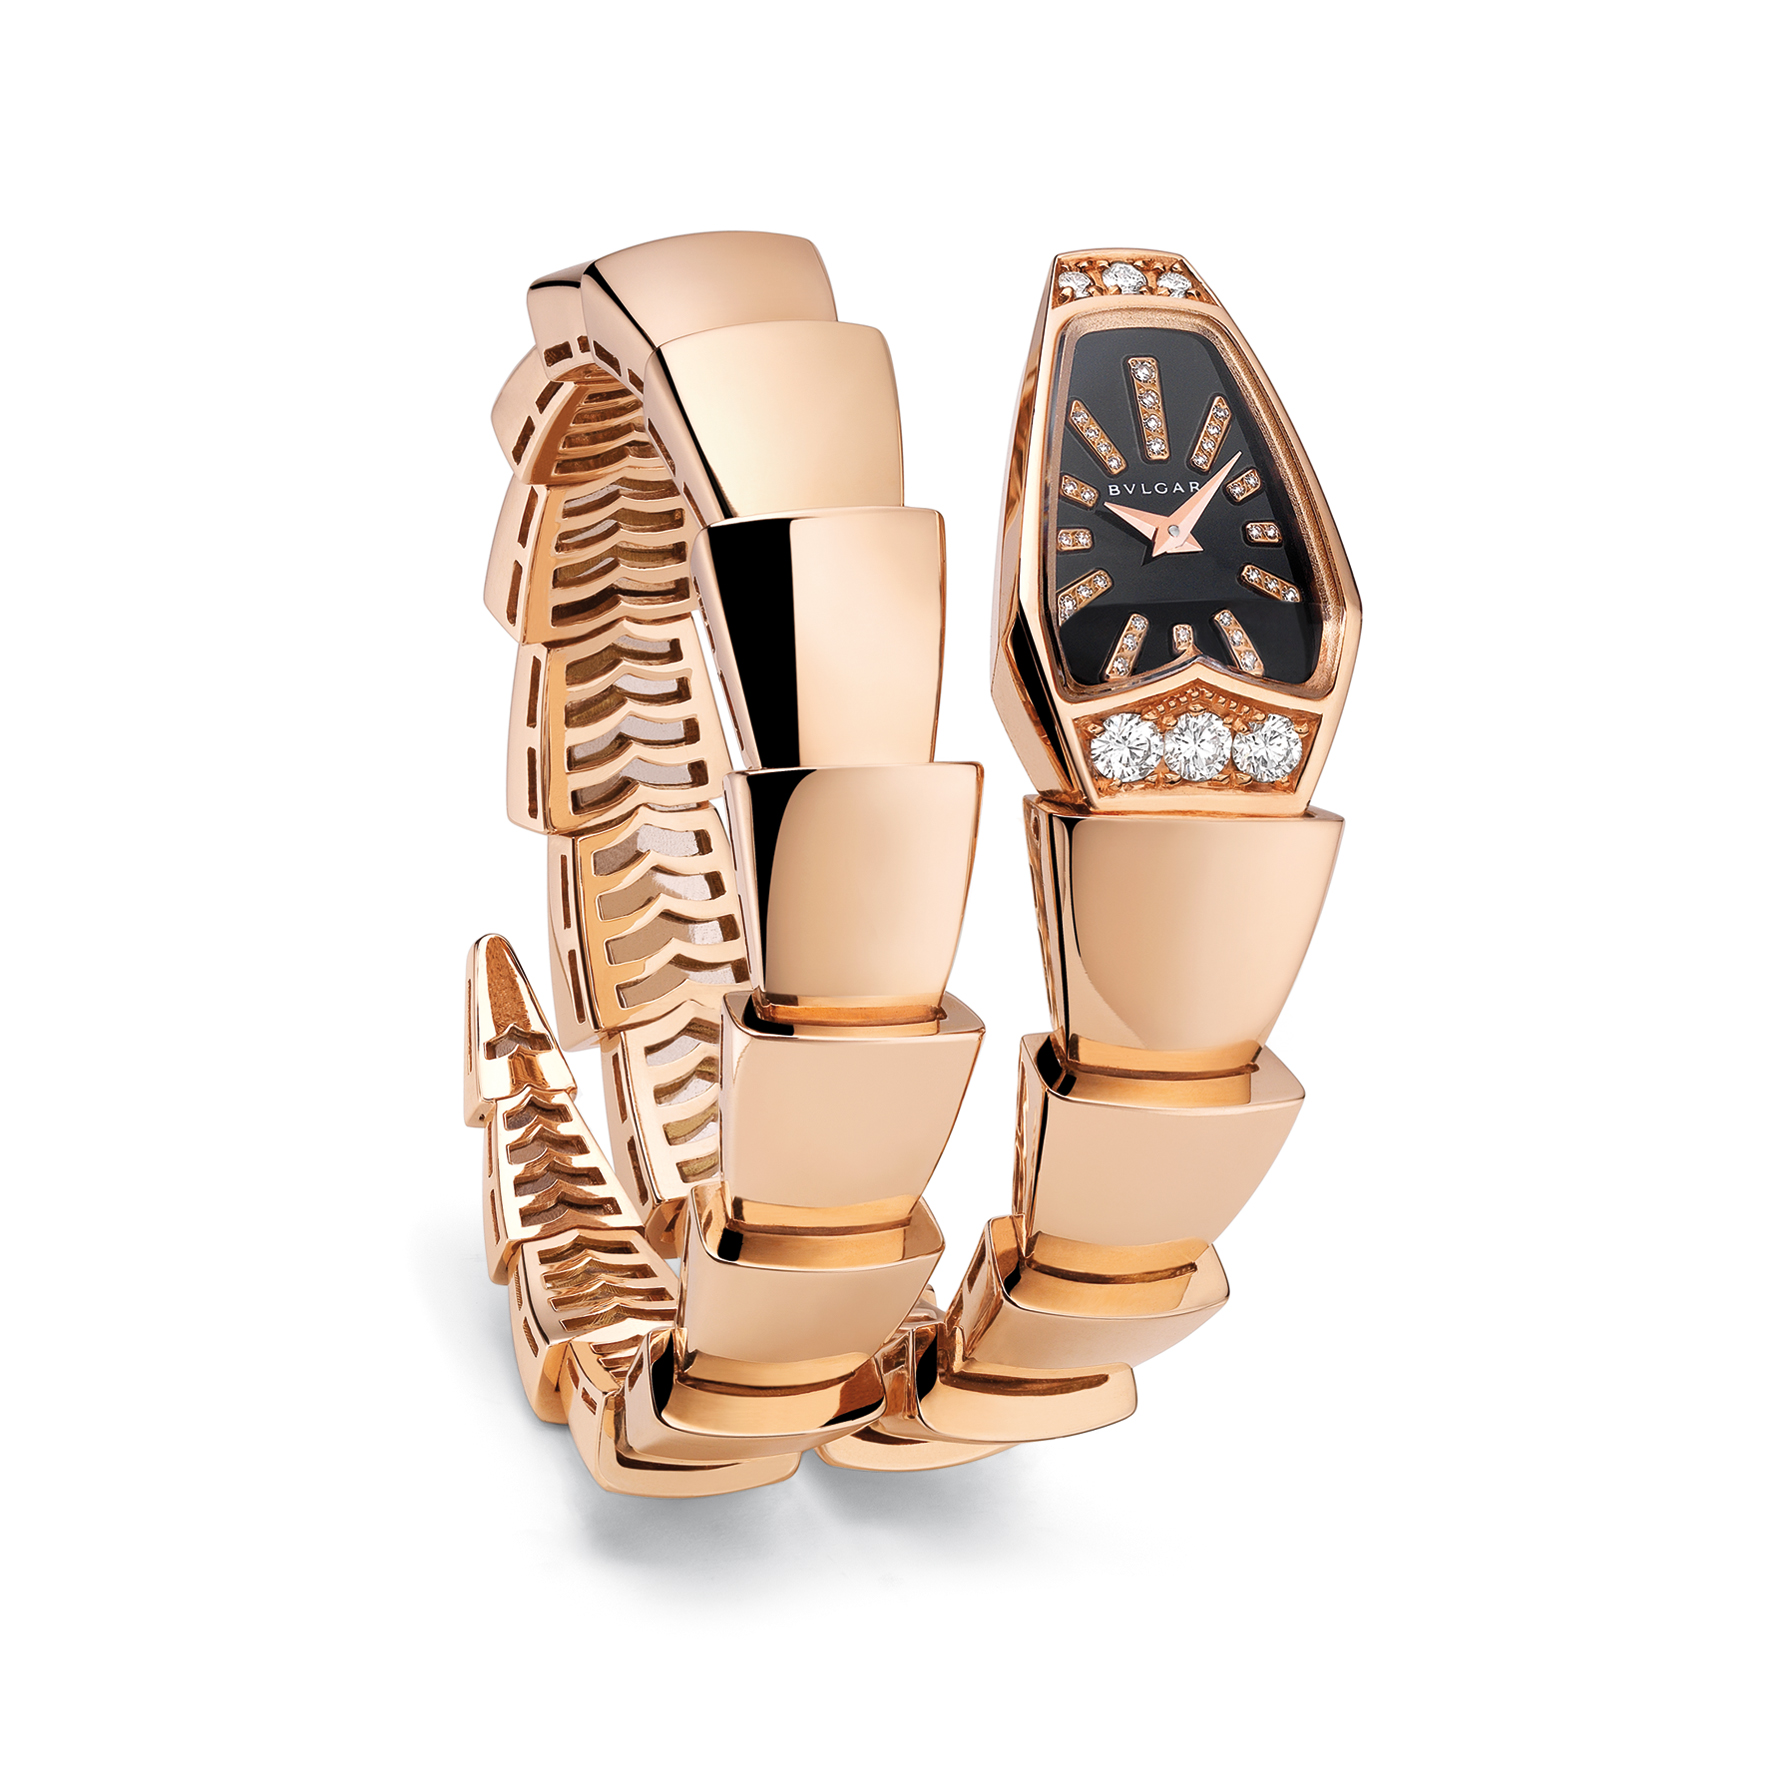 101788- Serpenti watch, 26mm, gold-diamonds-case, Mother of pearl Black-diamonds dial, Quartz movement, Diamonds 42 pce, Weight diamonds 0.700 [ct], Weight precious metal 77.2